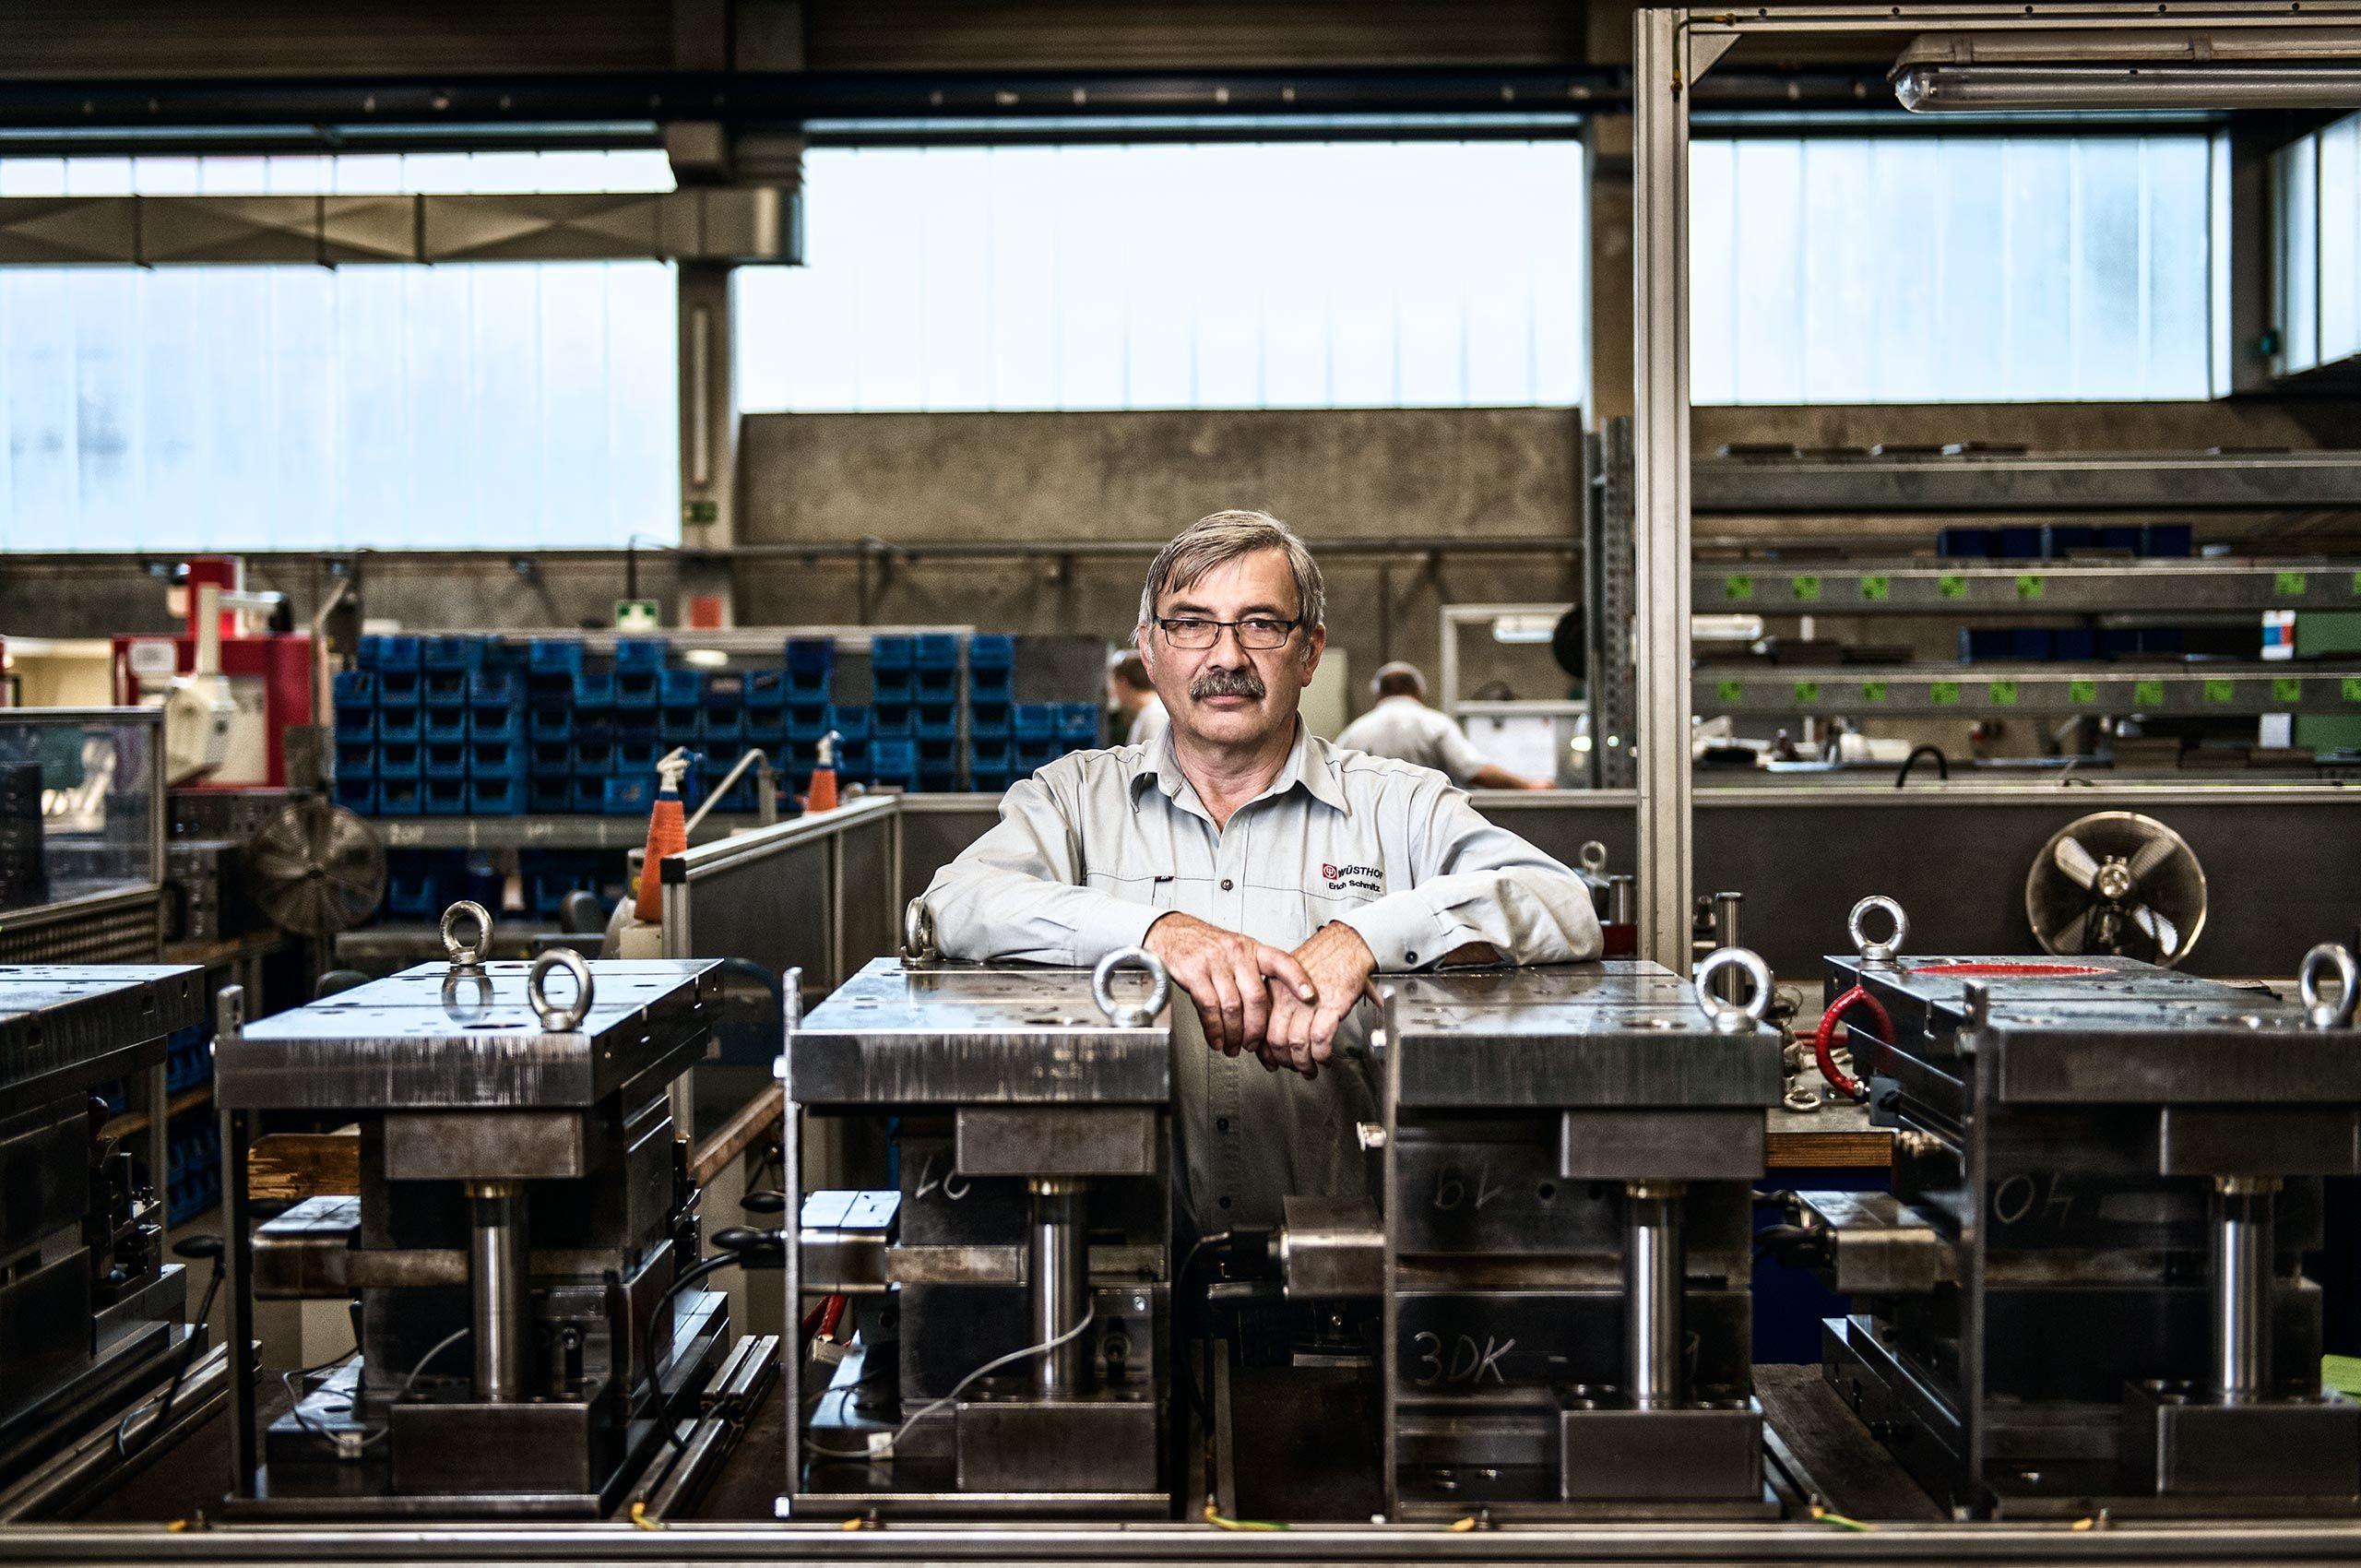 precision-manufacturing-wusthof-factory-HenrikOlundPhotography.jpg